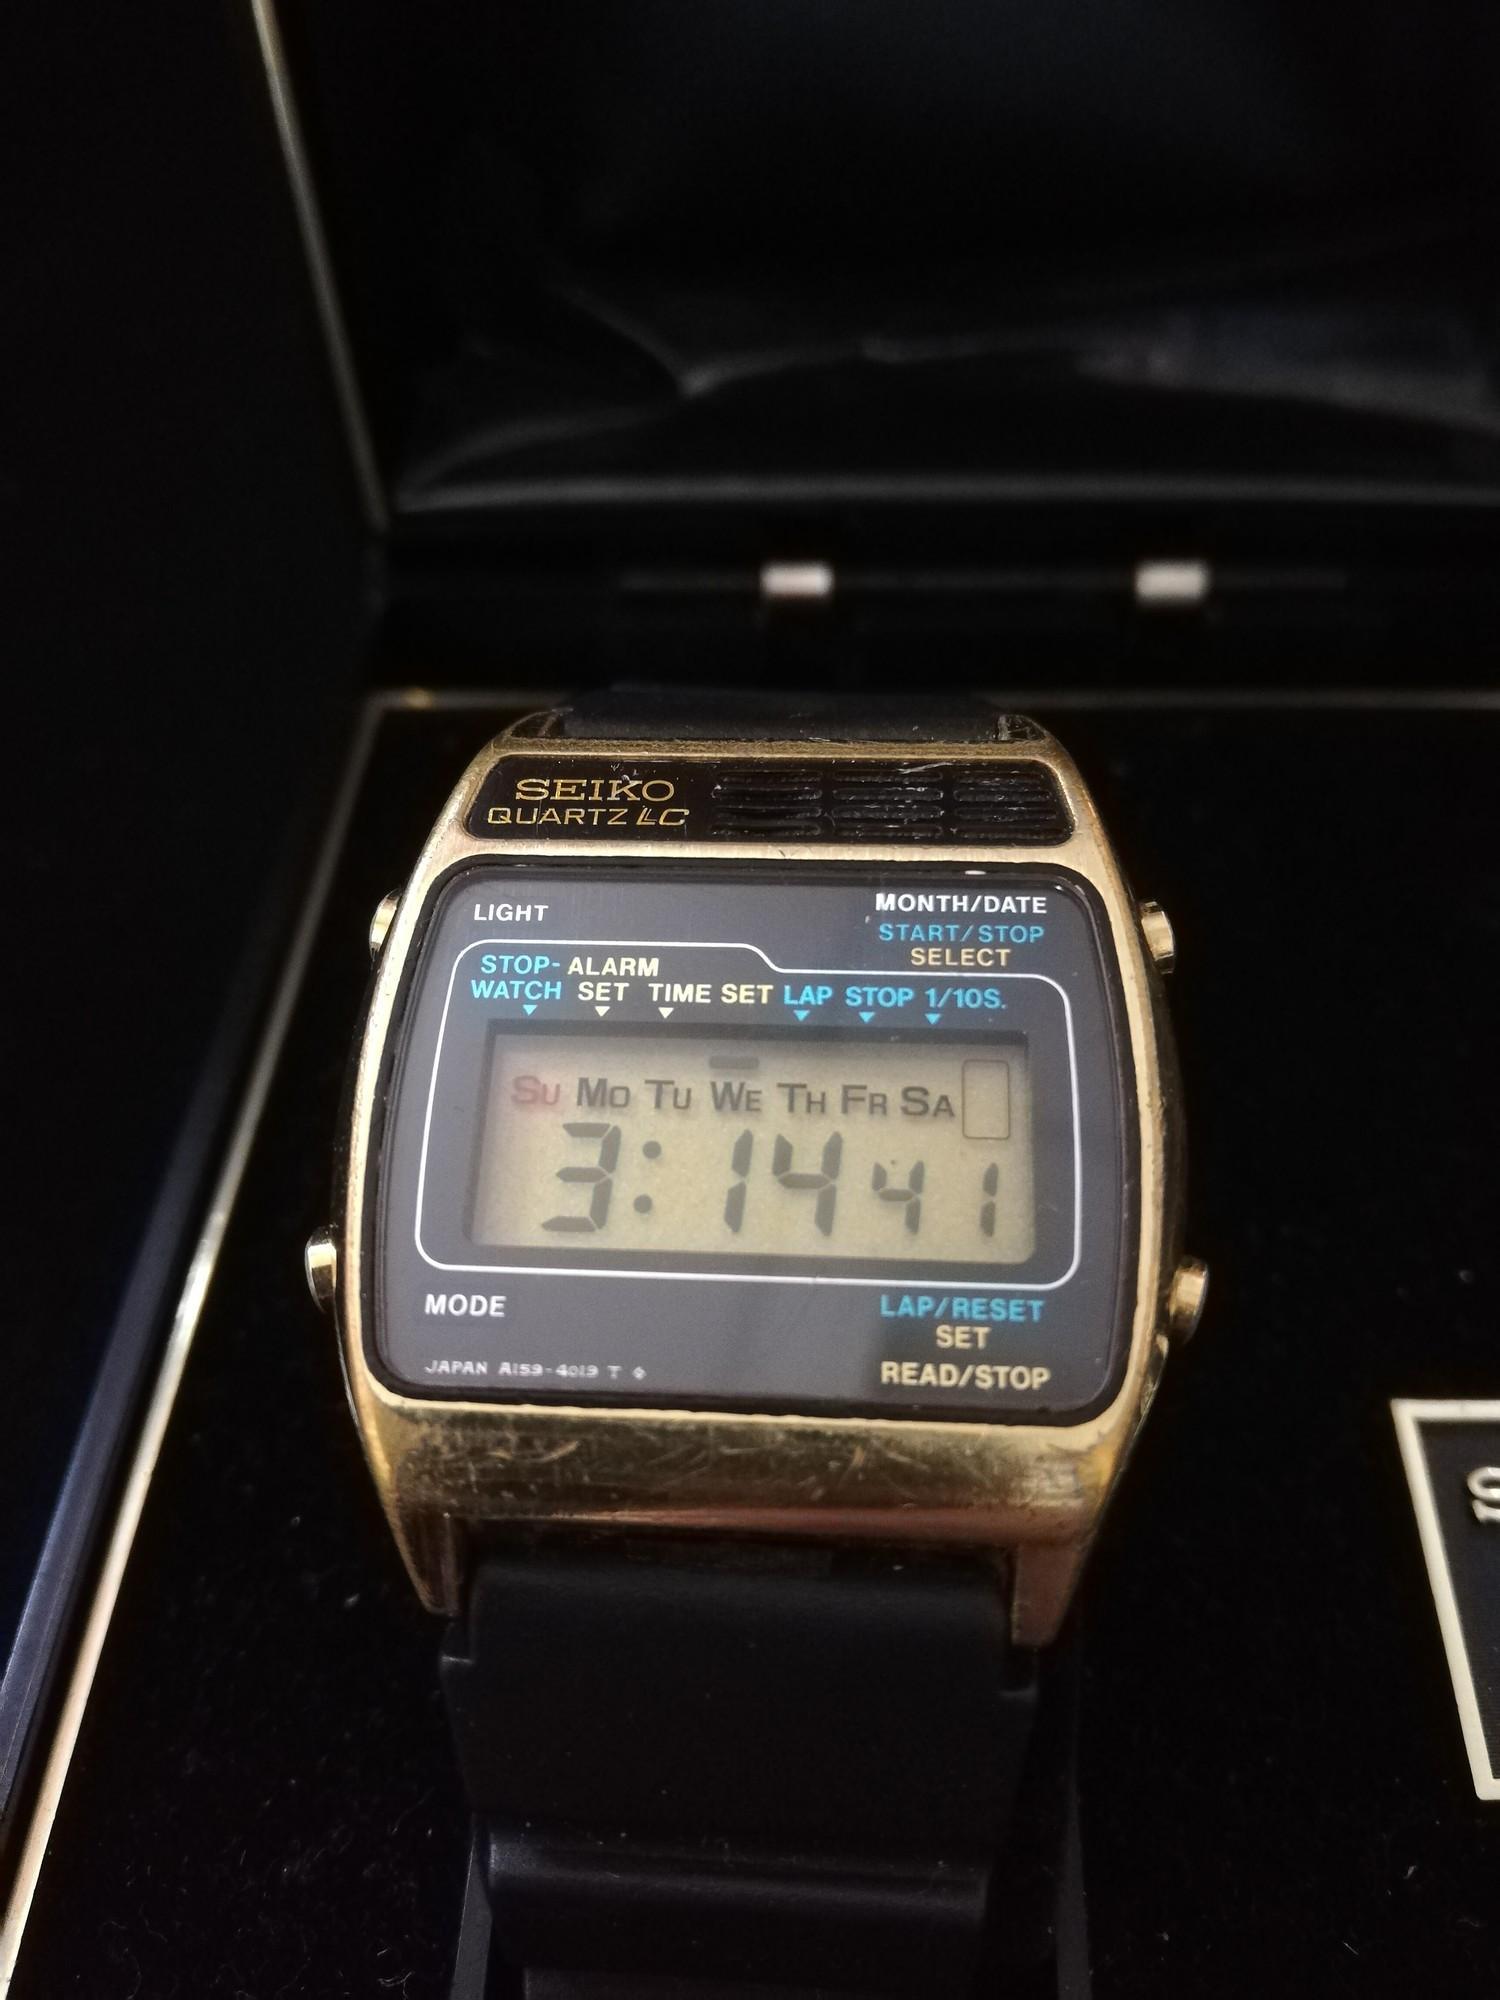 Seiko quartz LC wristwatch on rubber strap in original box - Image 2 of 3